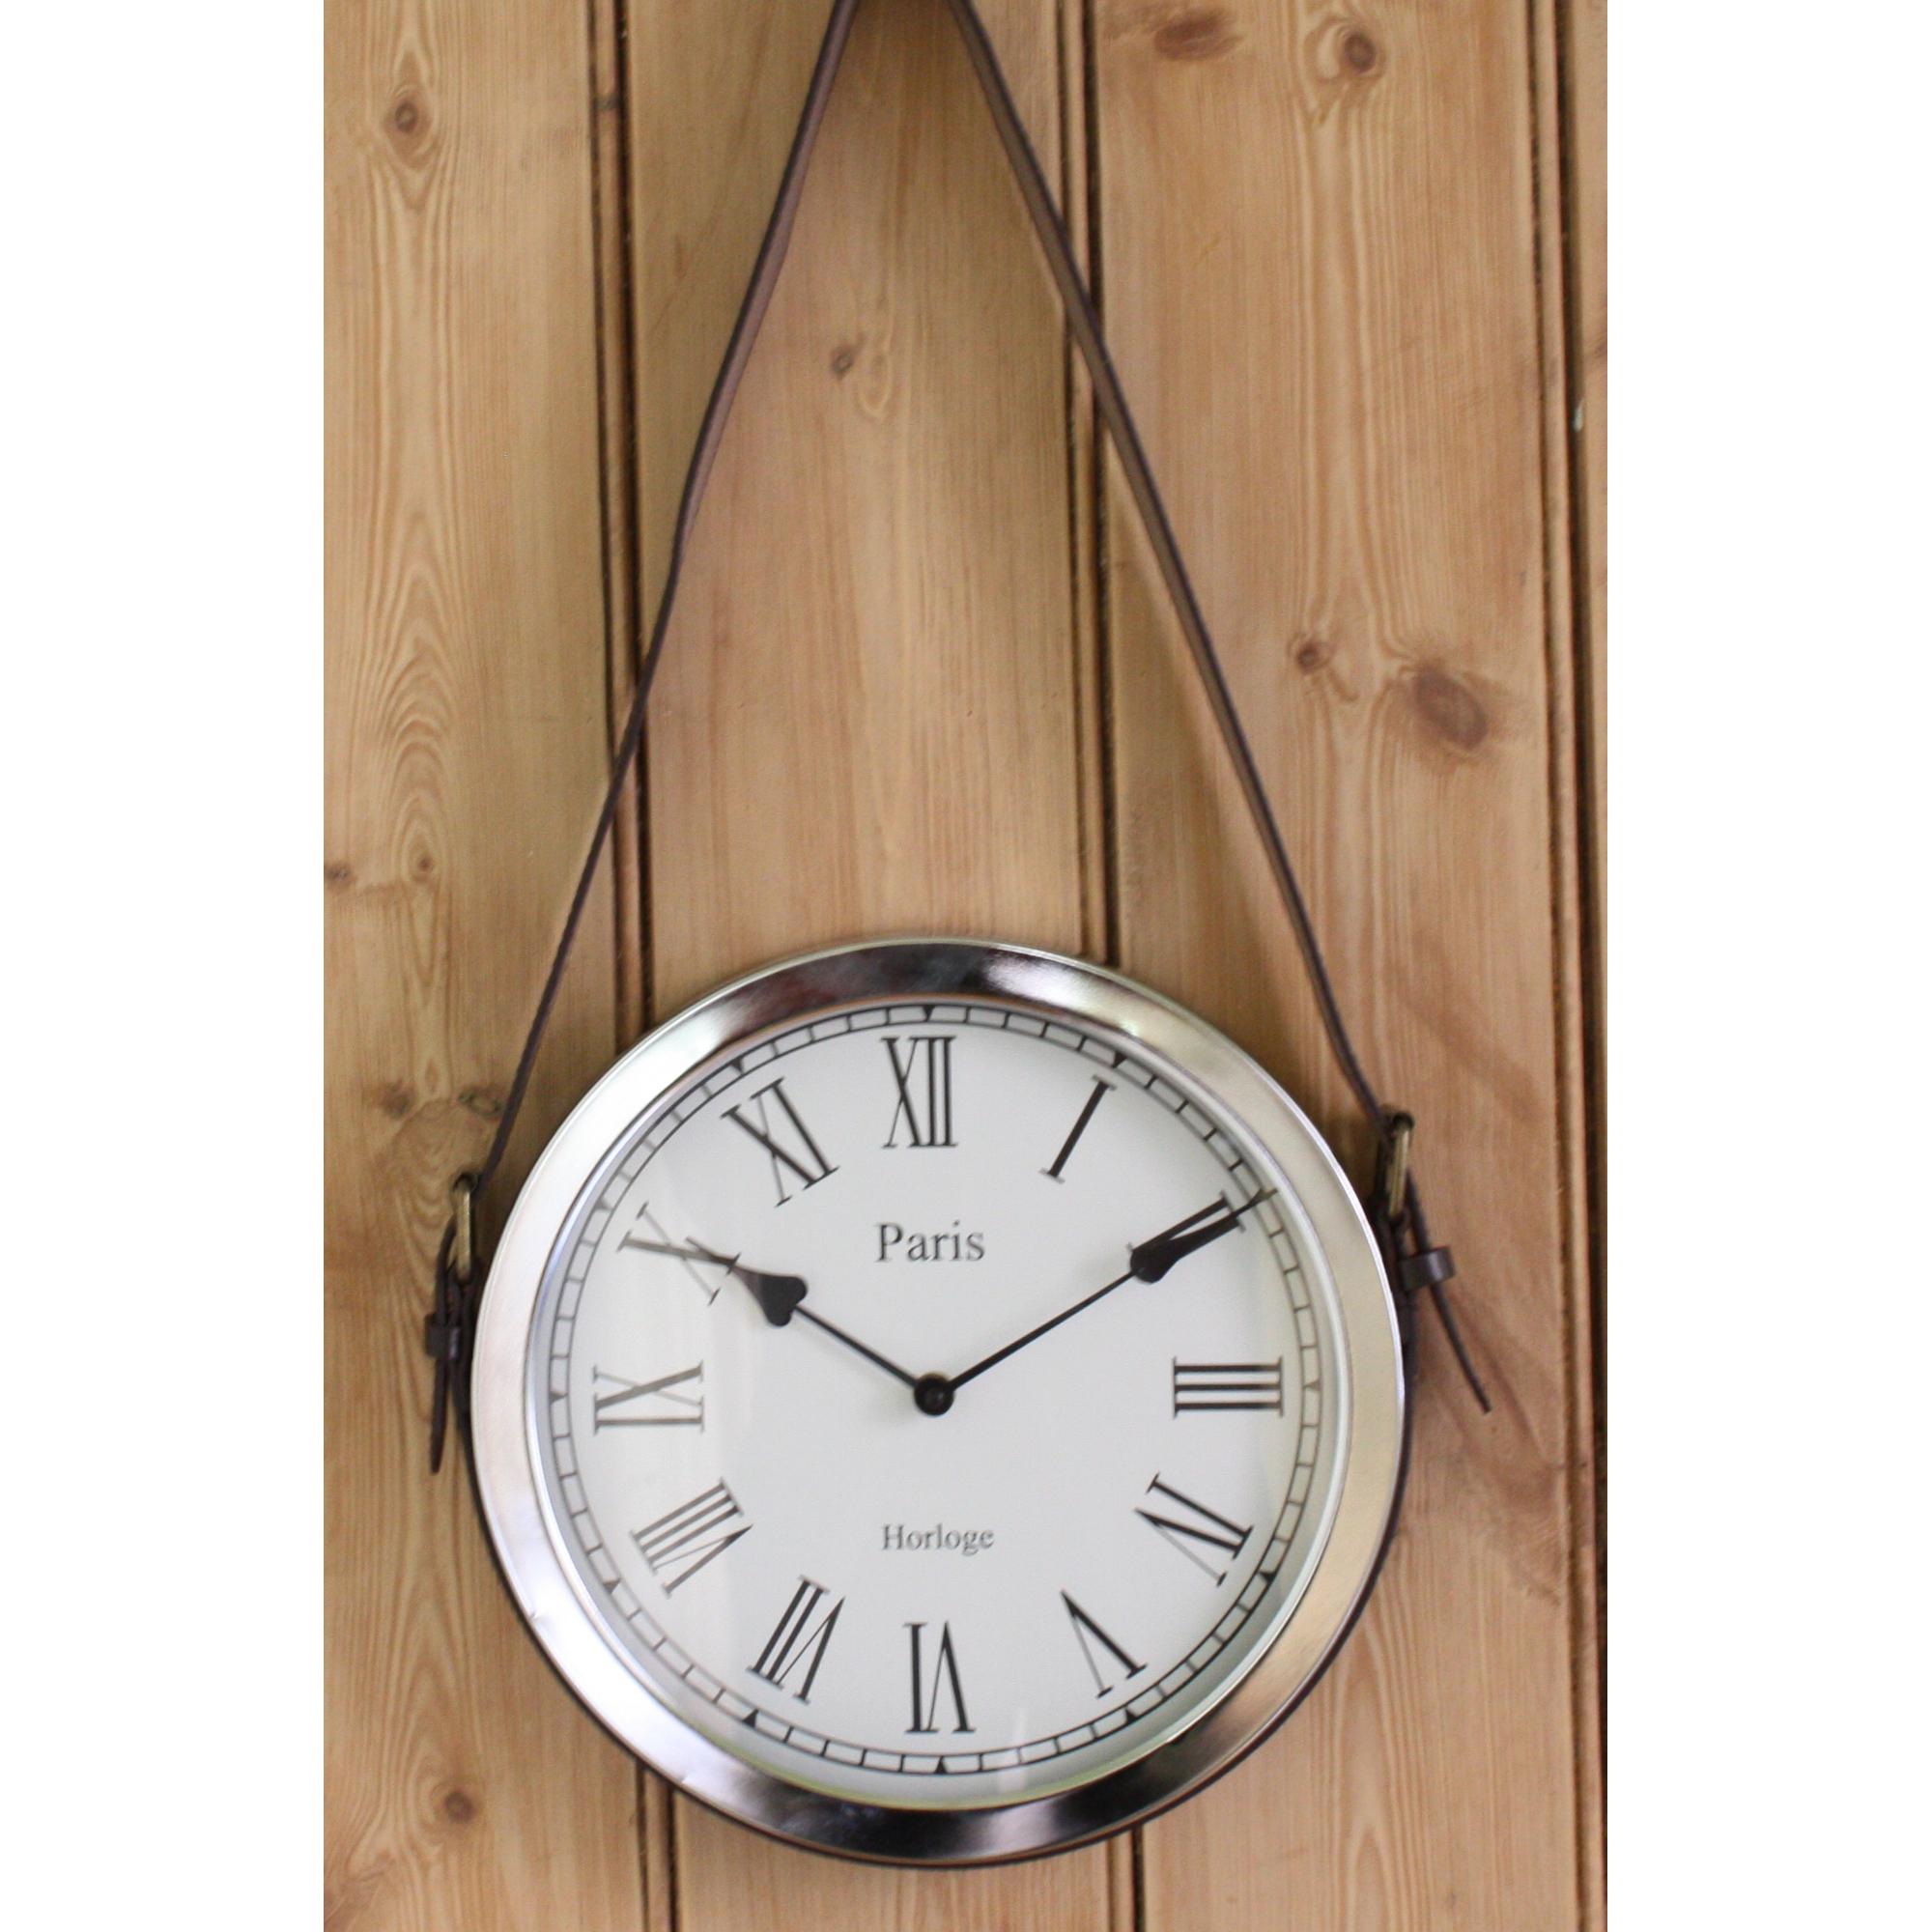 Metal Chrome Hanging Leather Belt Wall Clock Blendboutique